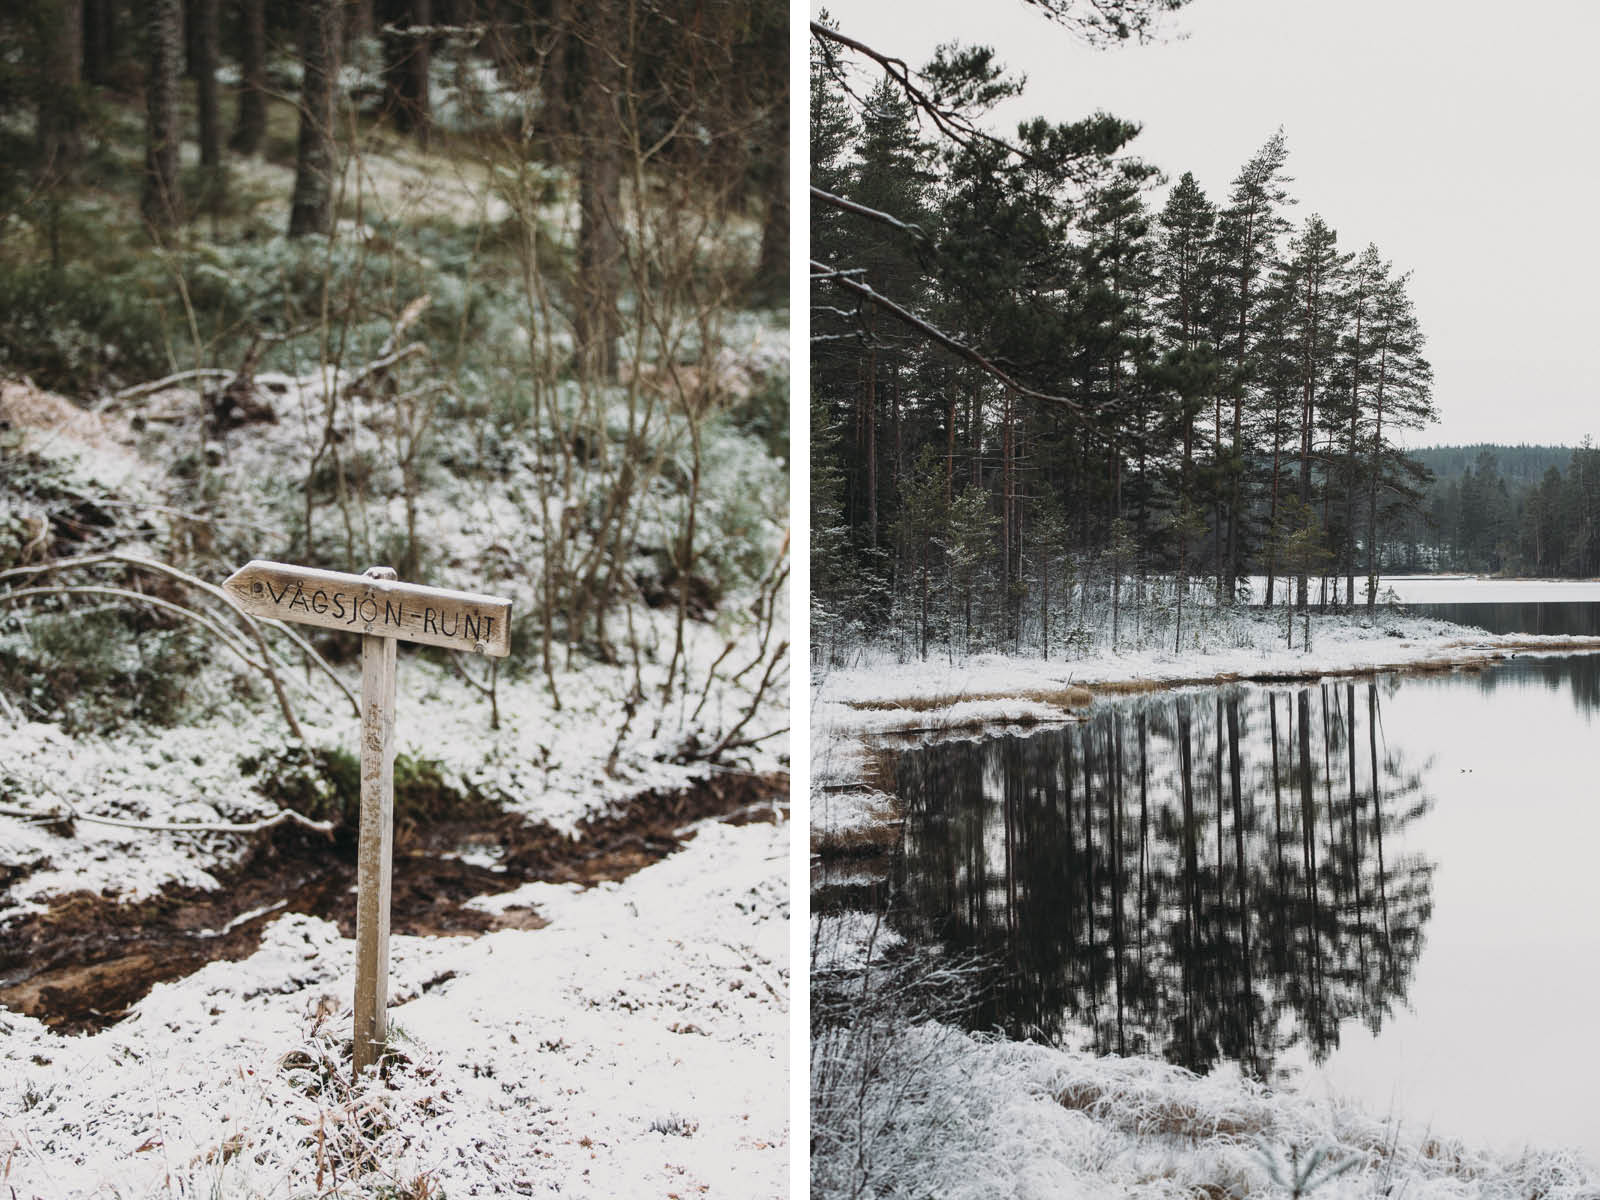 Sweden_roadtrip_Evabloem-092.jpg